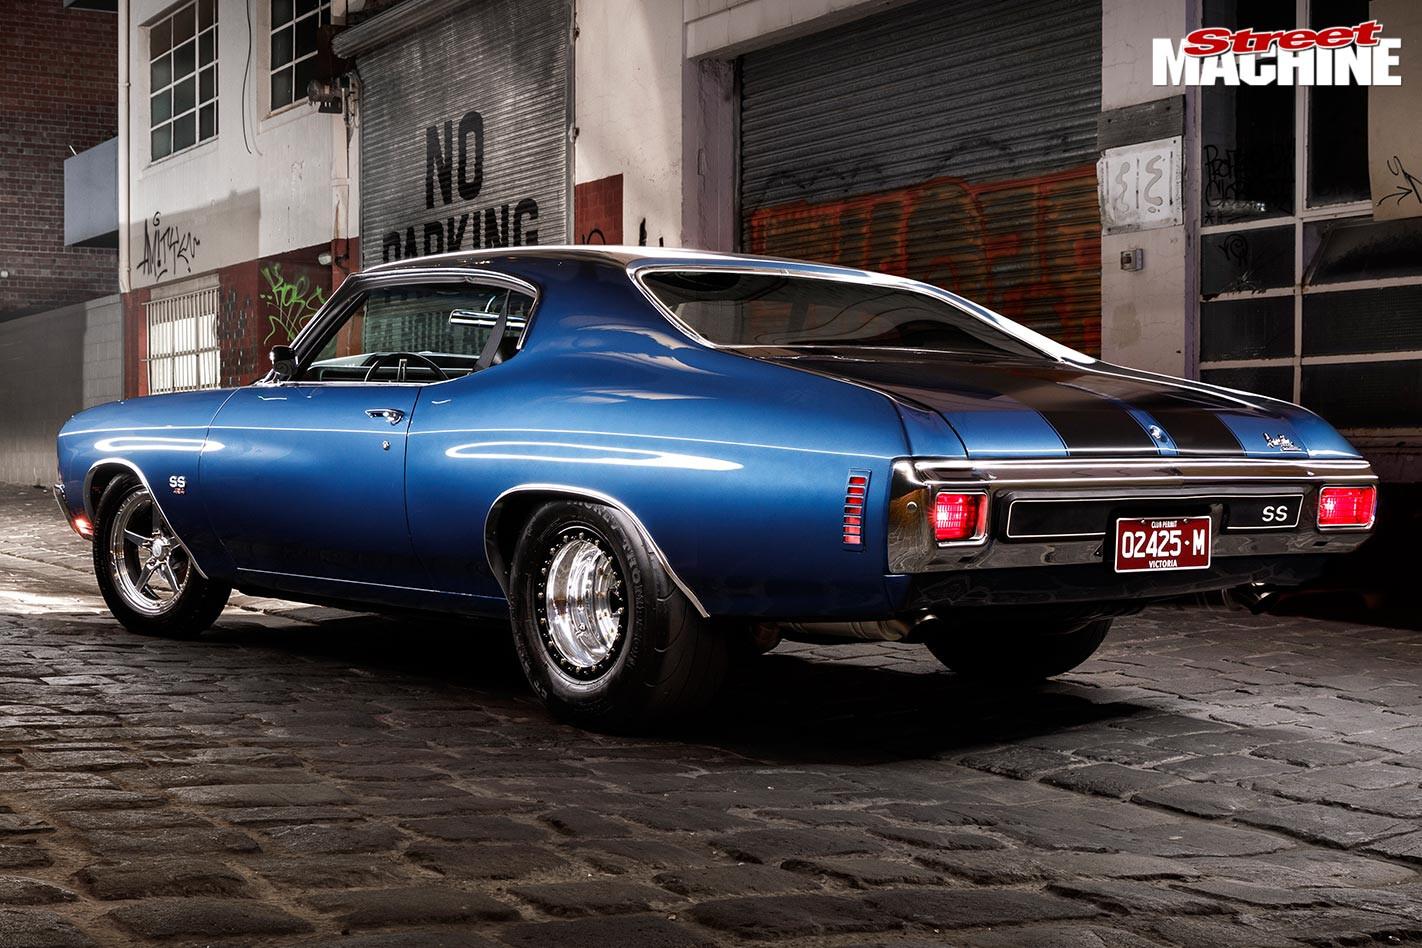 Chevelle rear angle